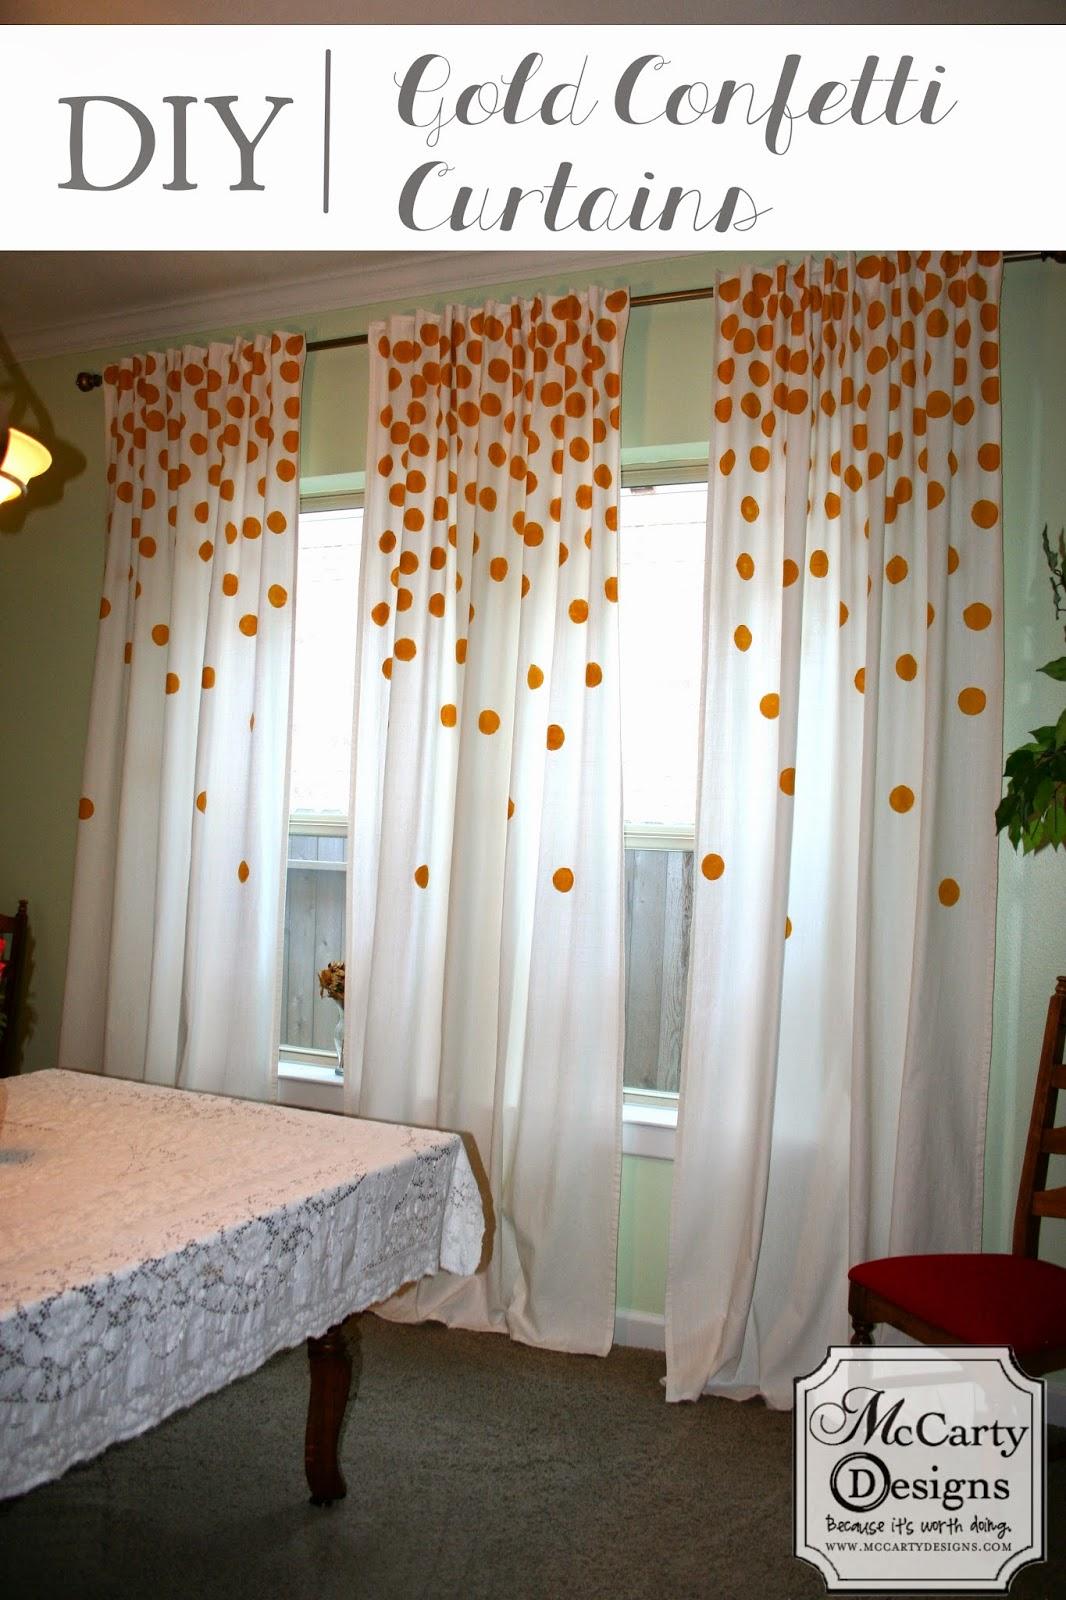 DIY Gold Confetti Curtains. DIY Gold Confetti Curtains   McCarty Adventures